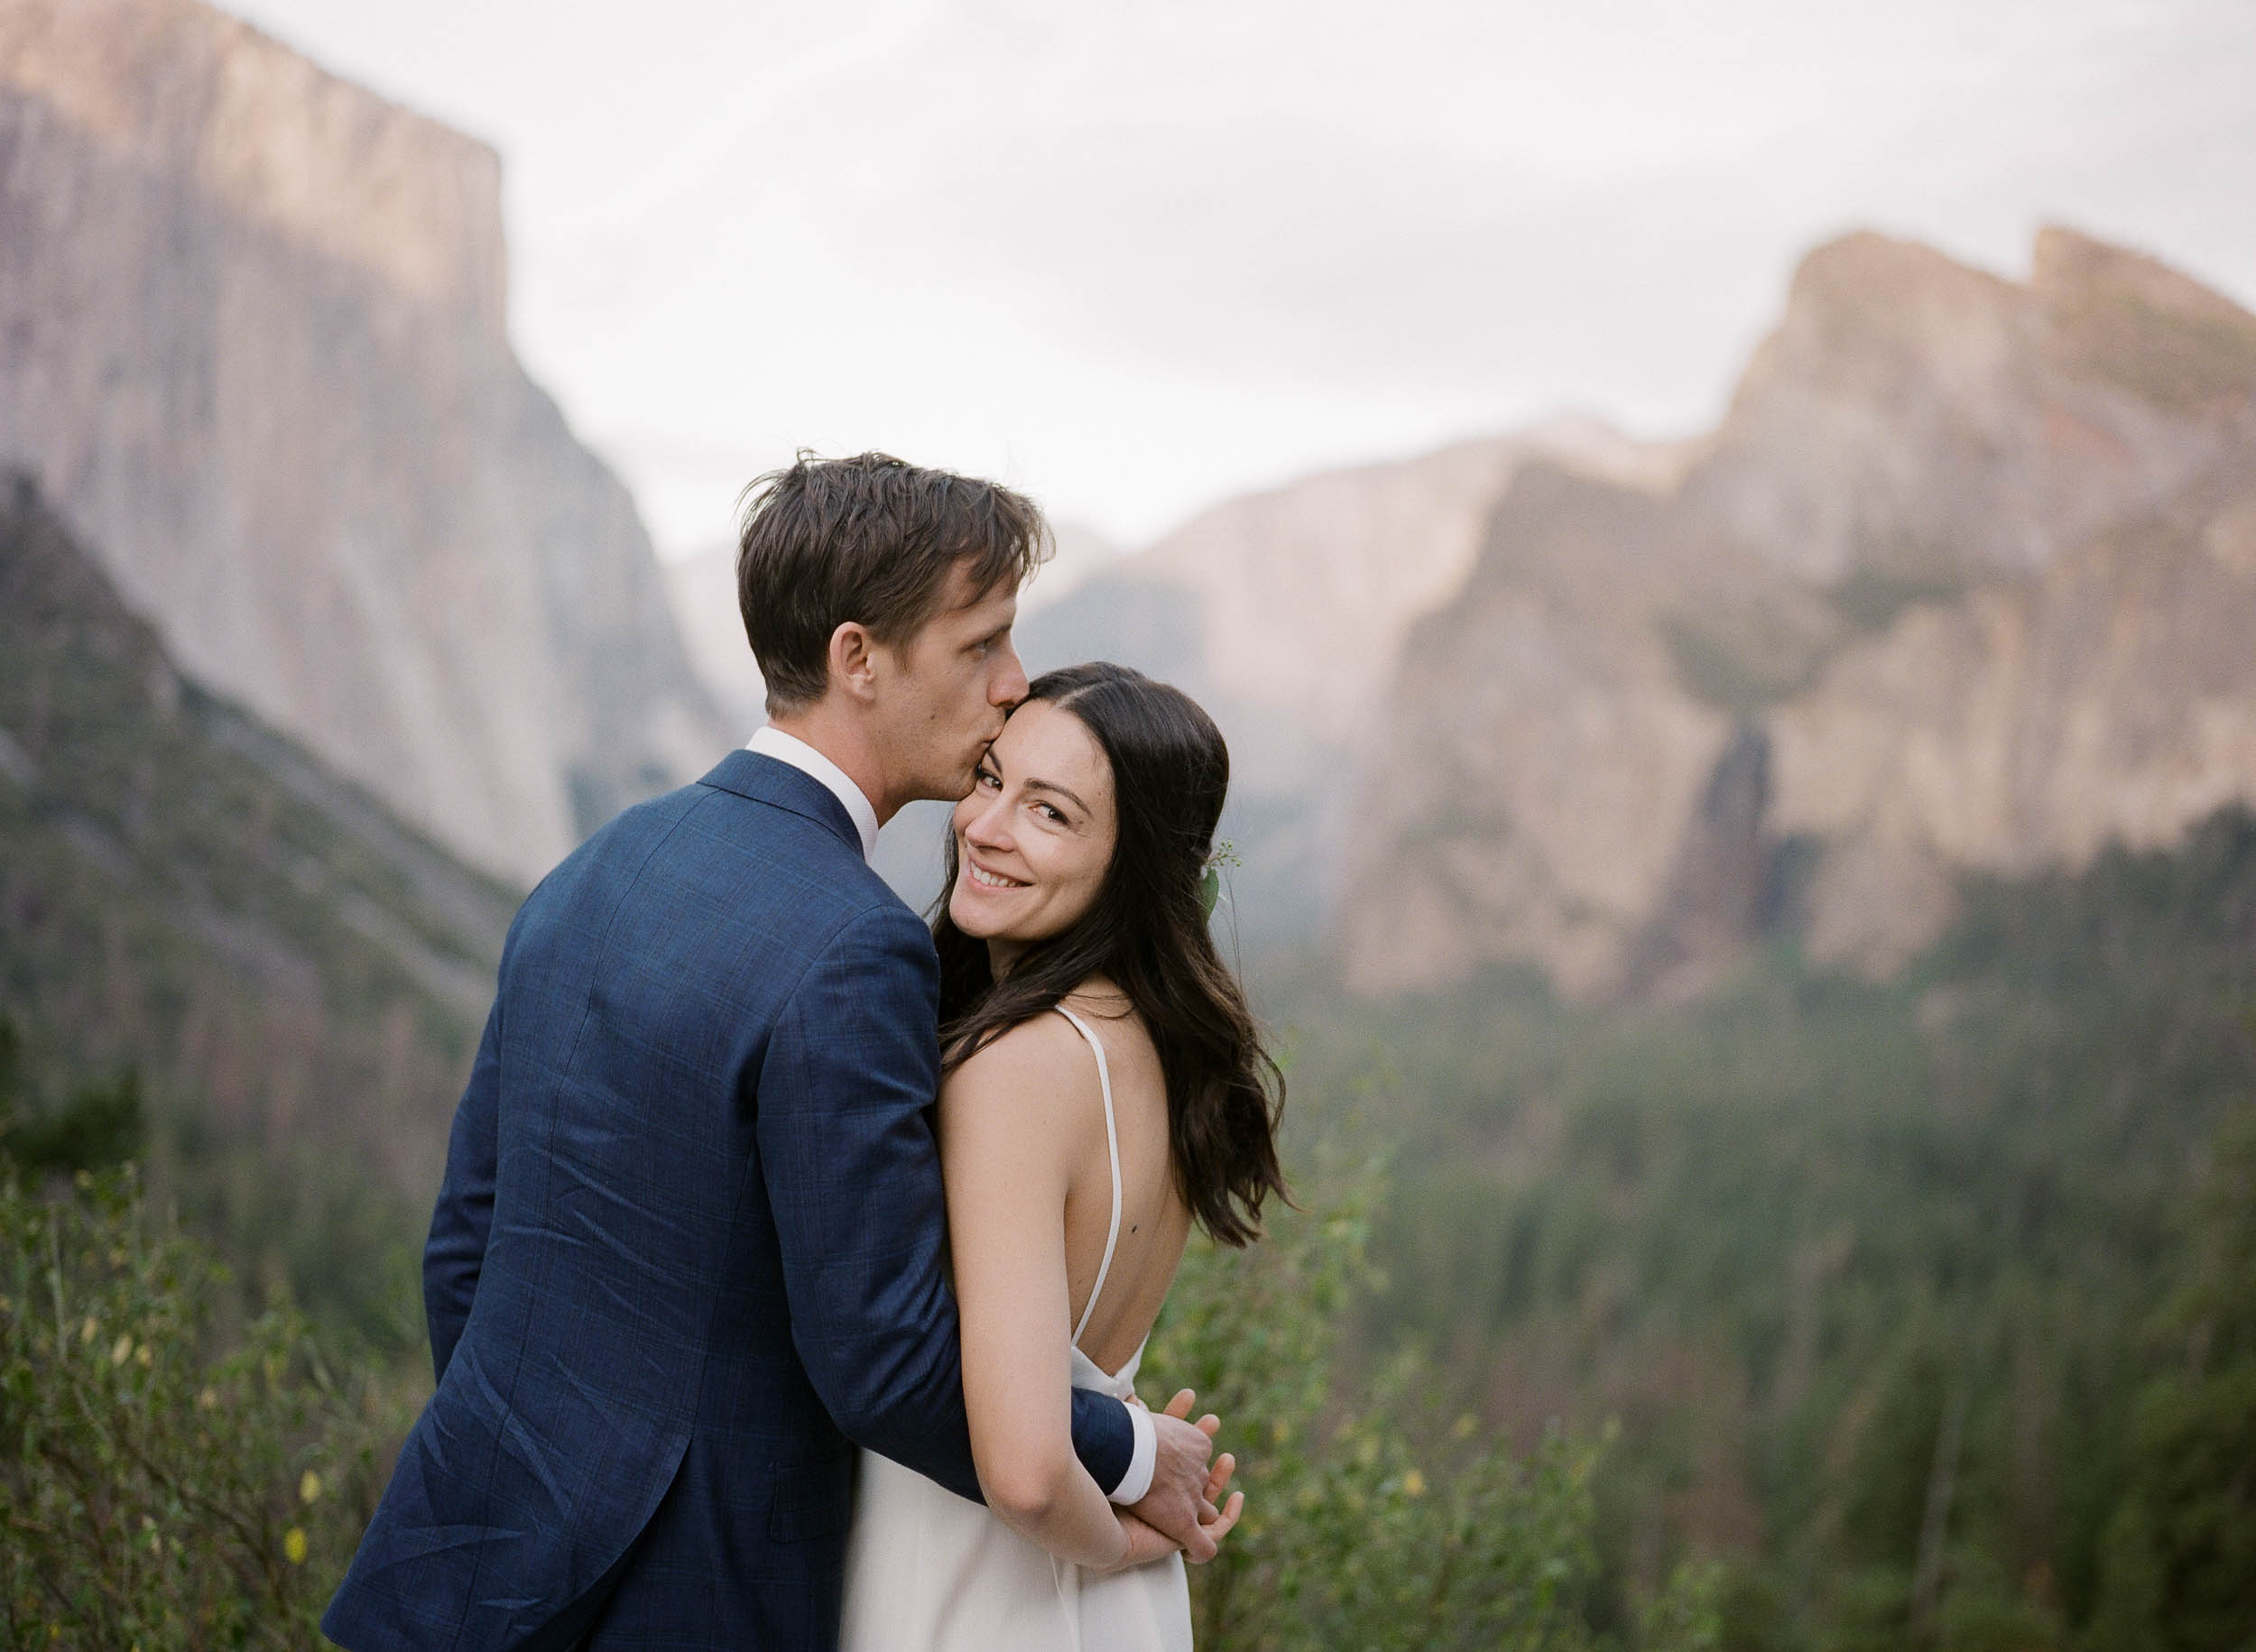 Intimate Yosemite Wedding_Buena Lane Photography_000063840011-3.jpg